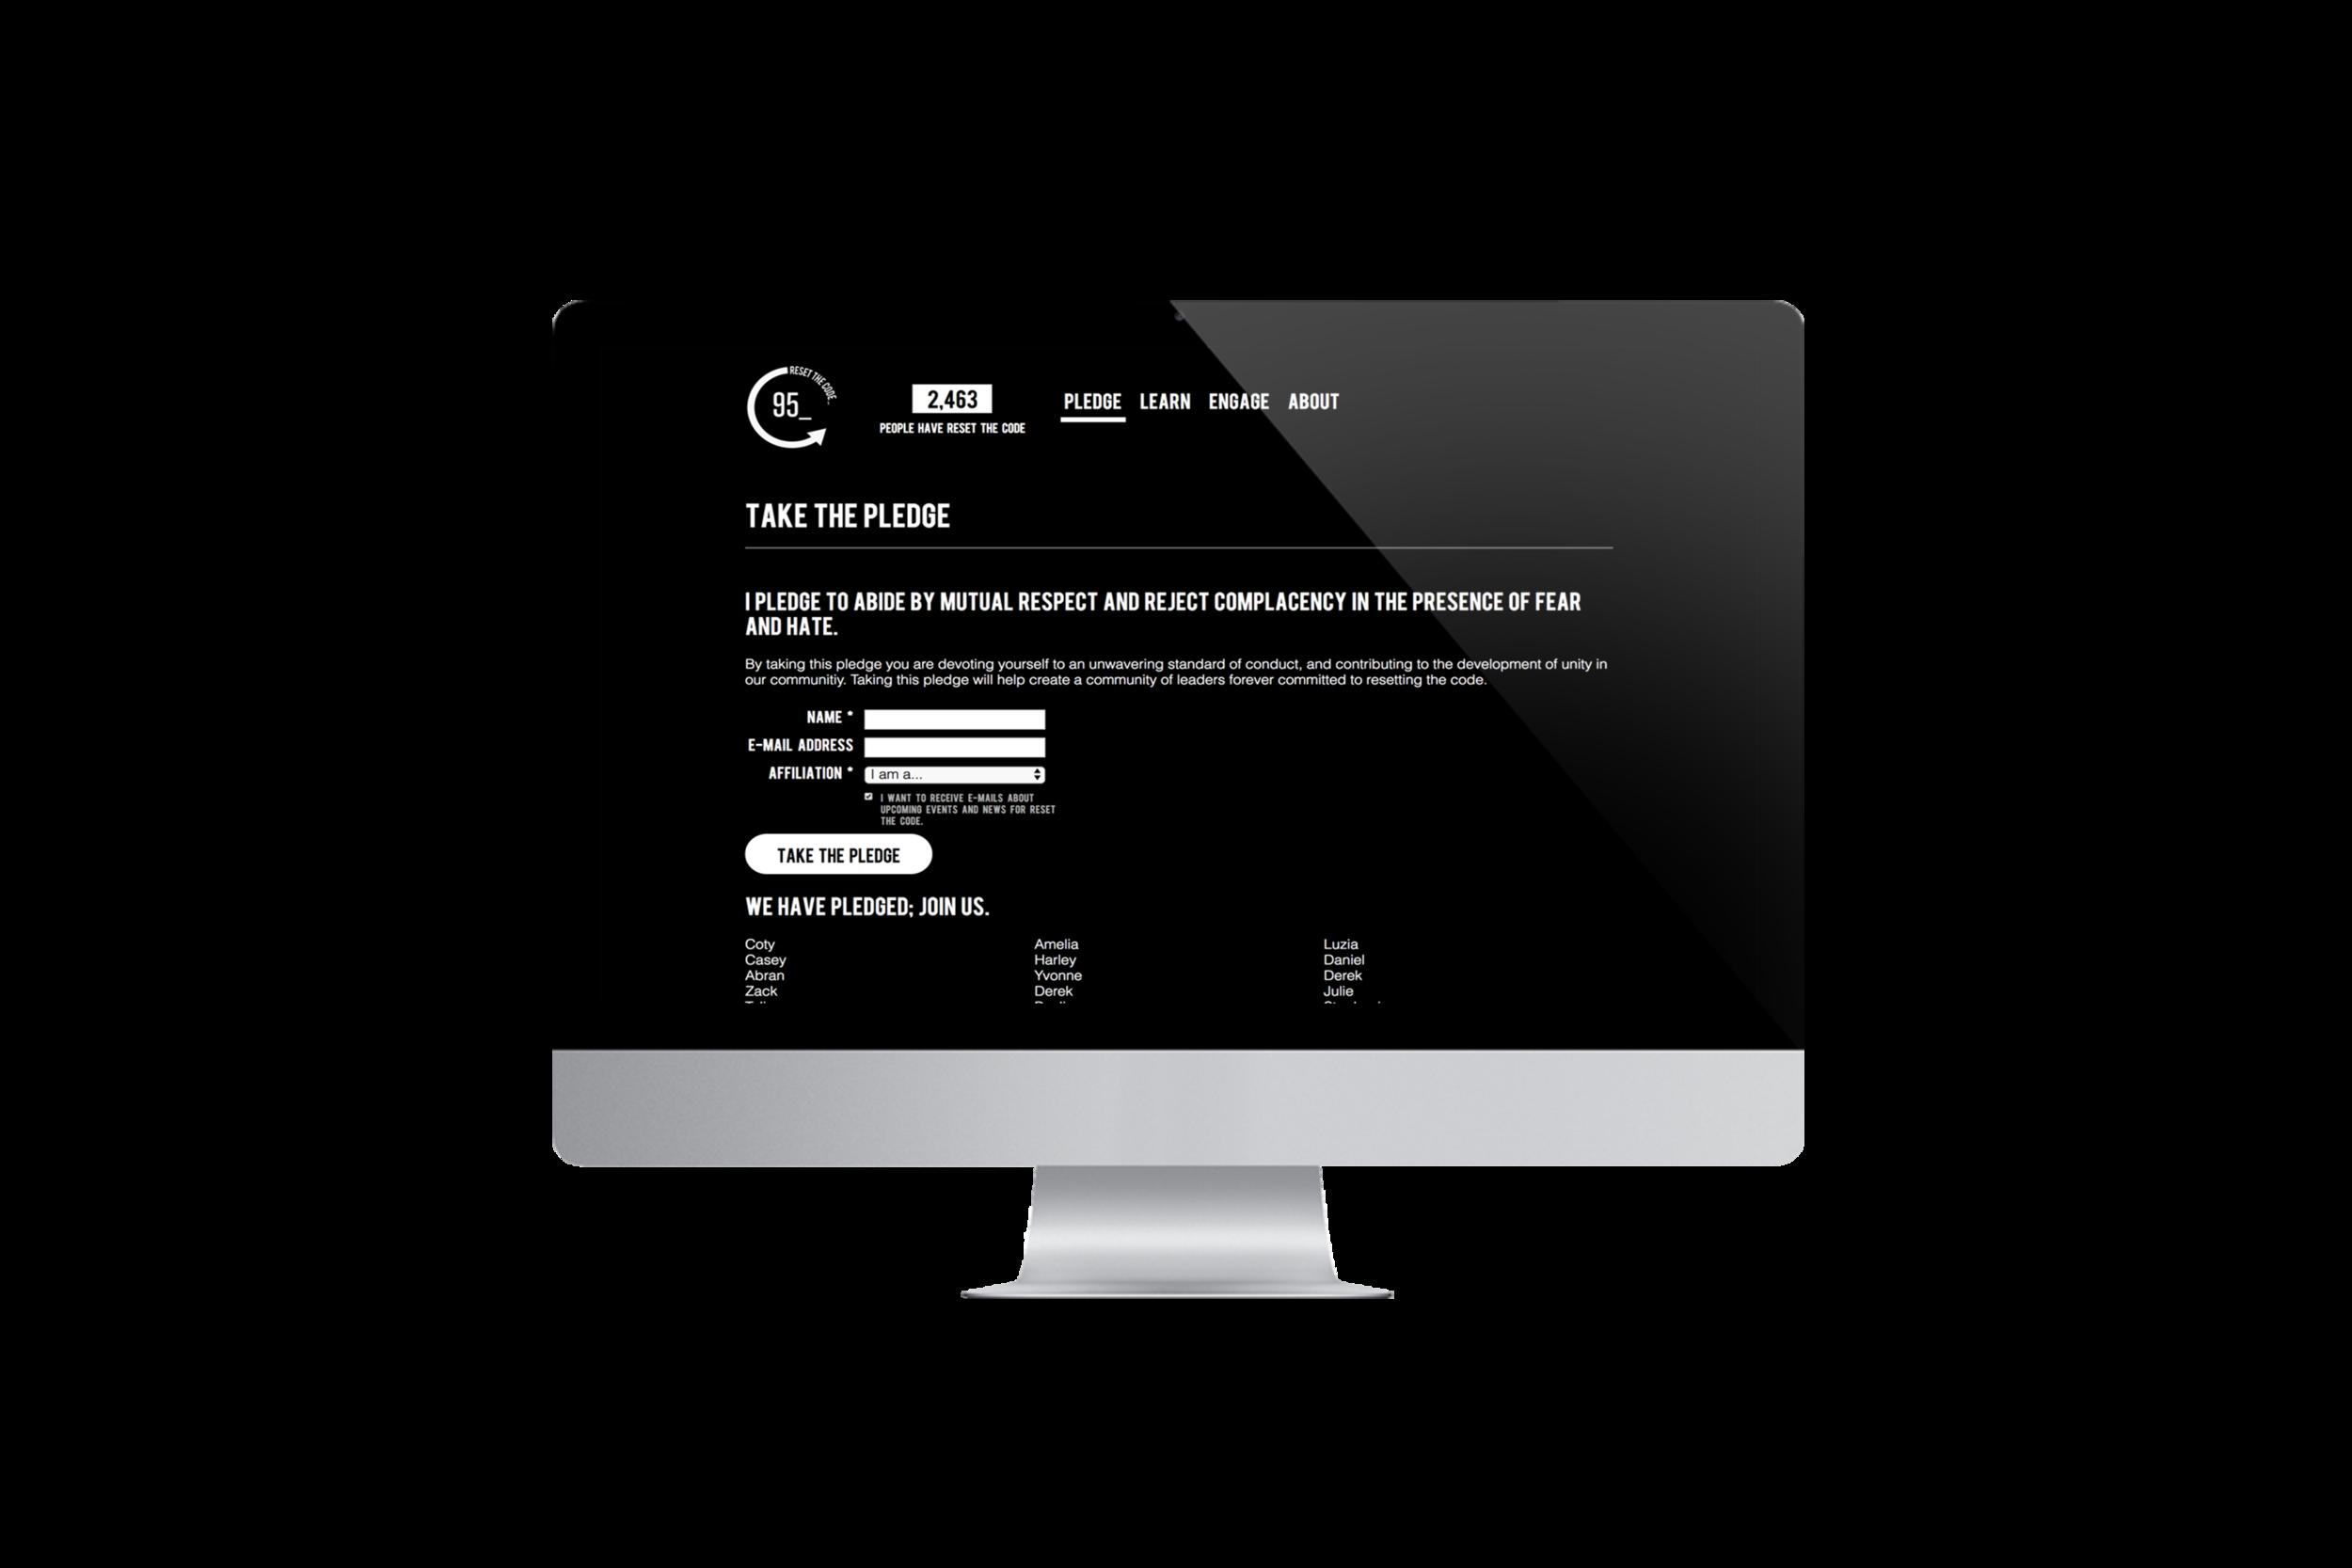 TakePledge-Desktop@2x.png